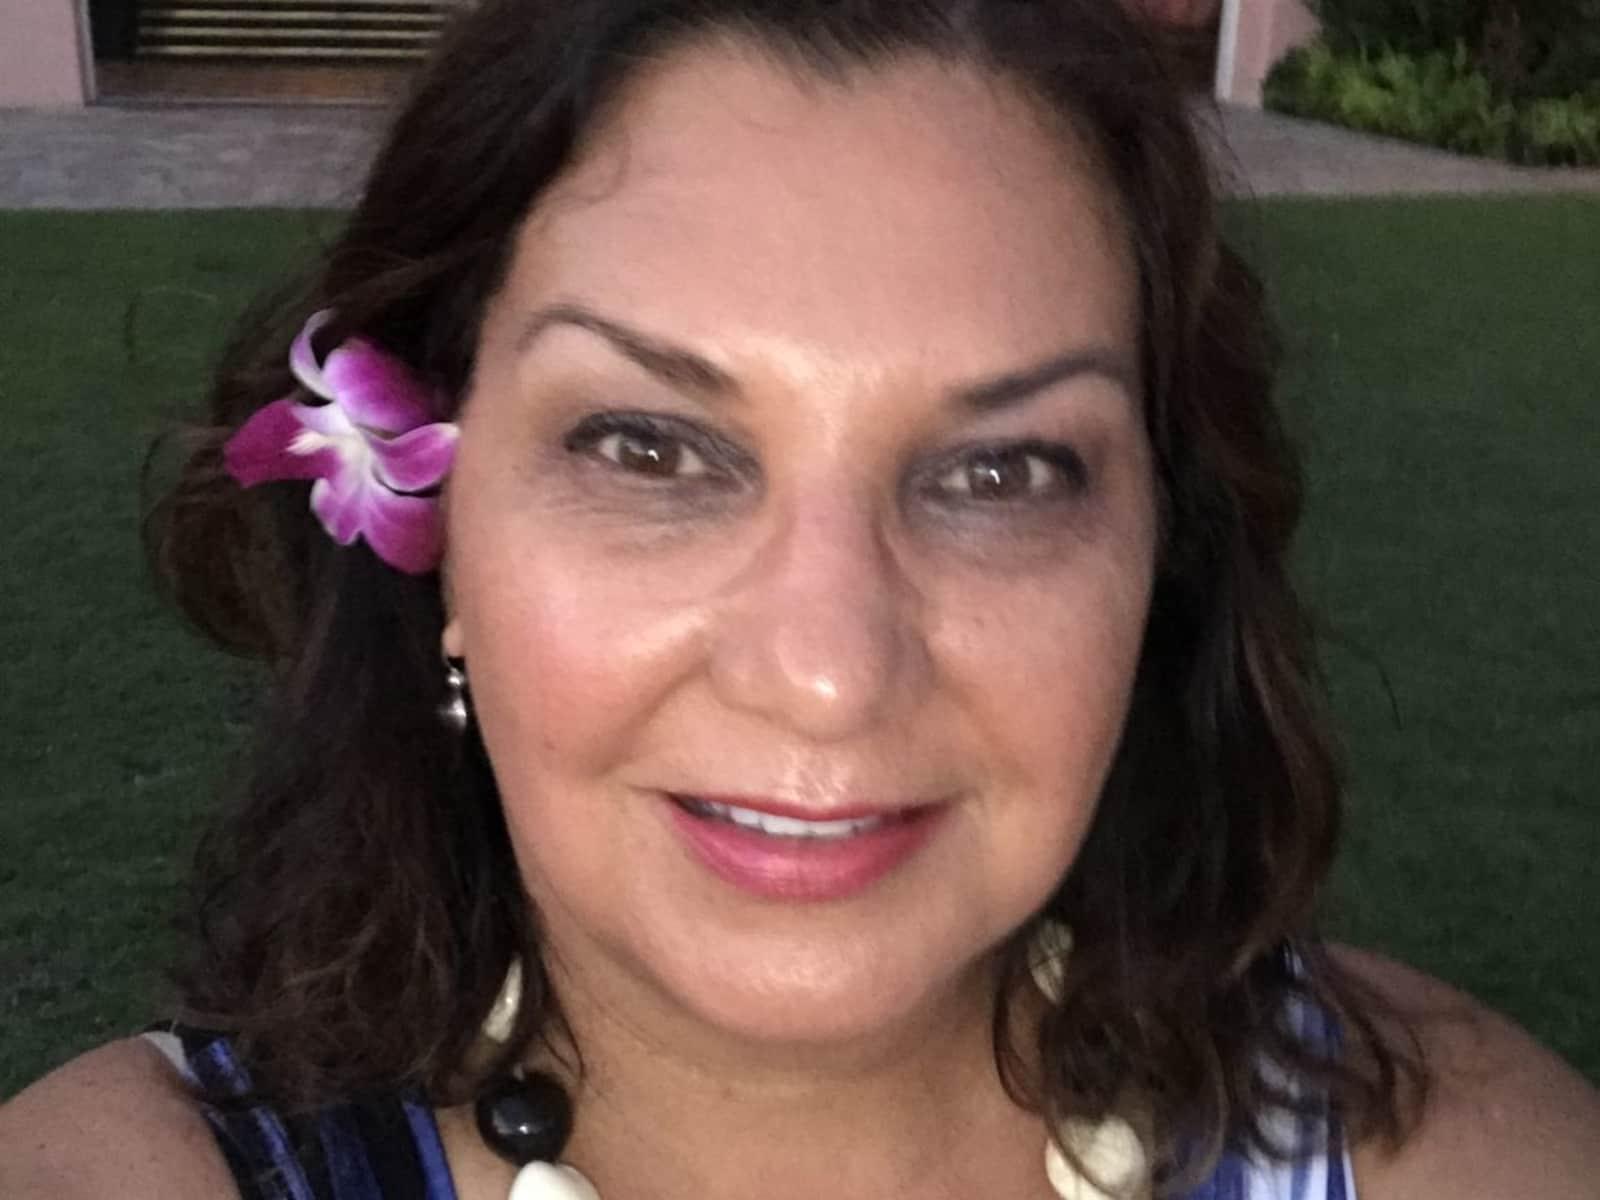 Laura from Fullerton, California, United States